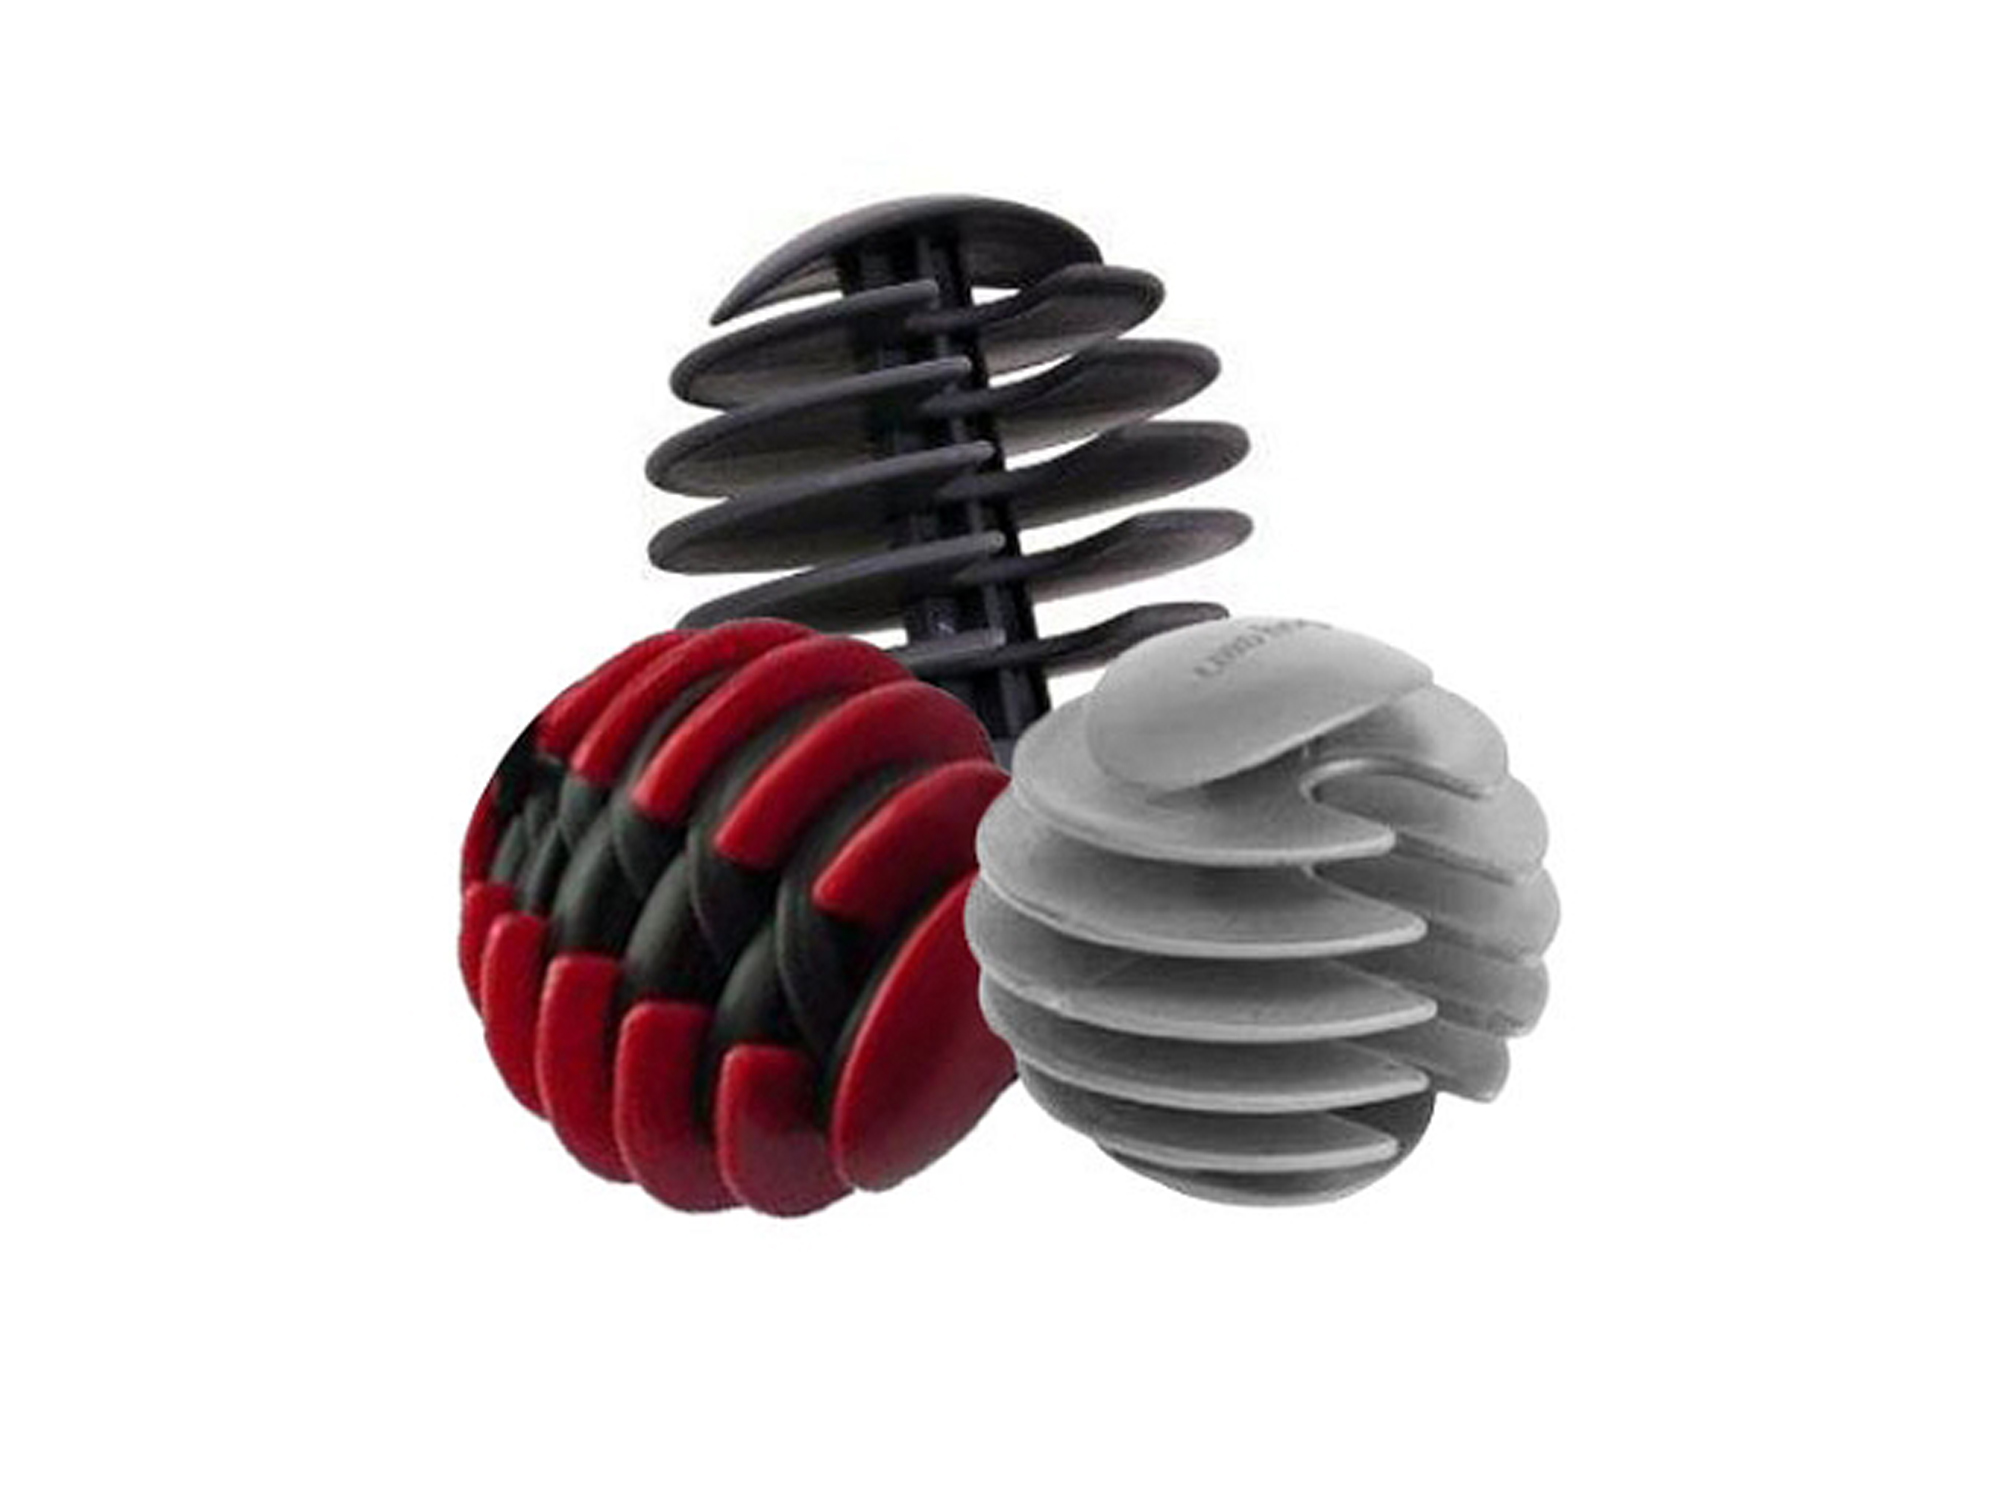 CORD HOG     Cord Management Ball